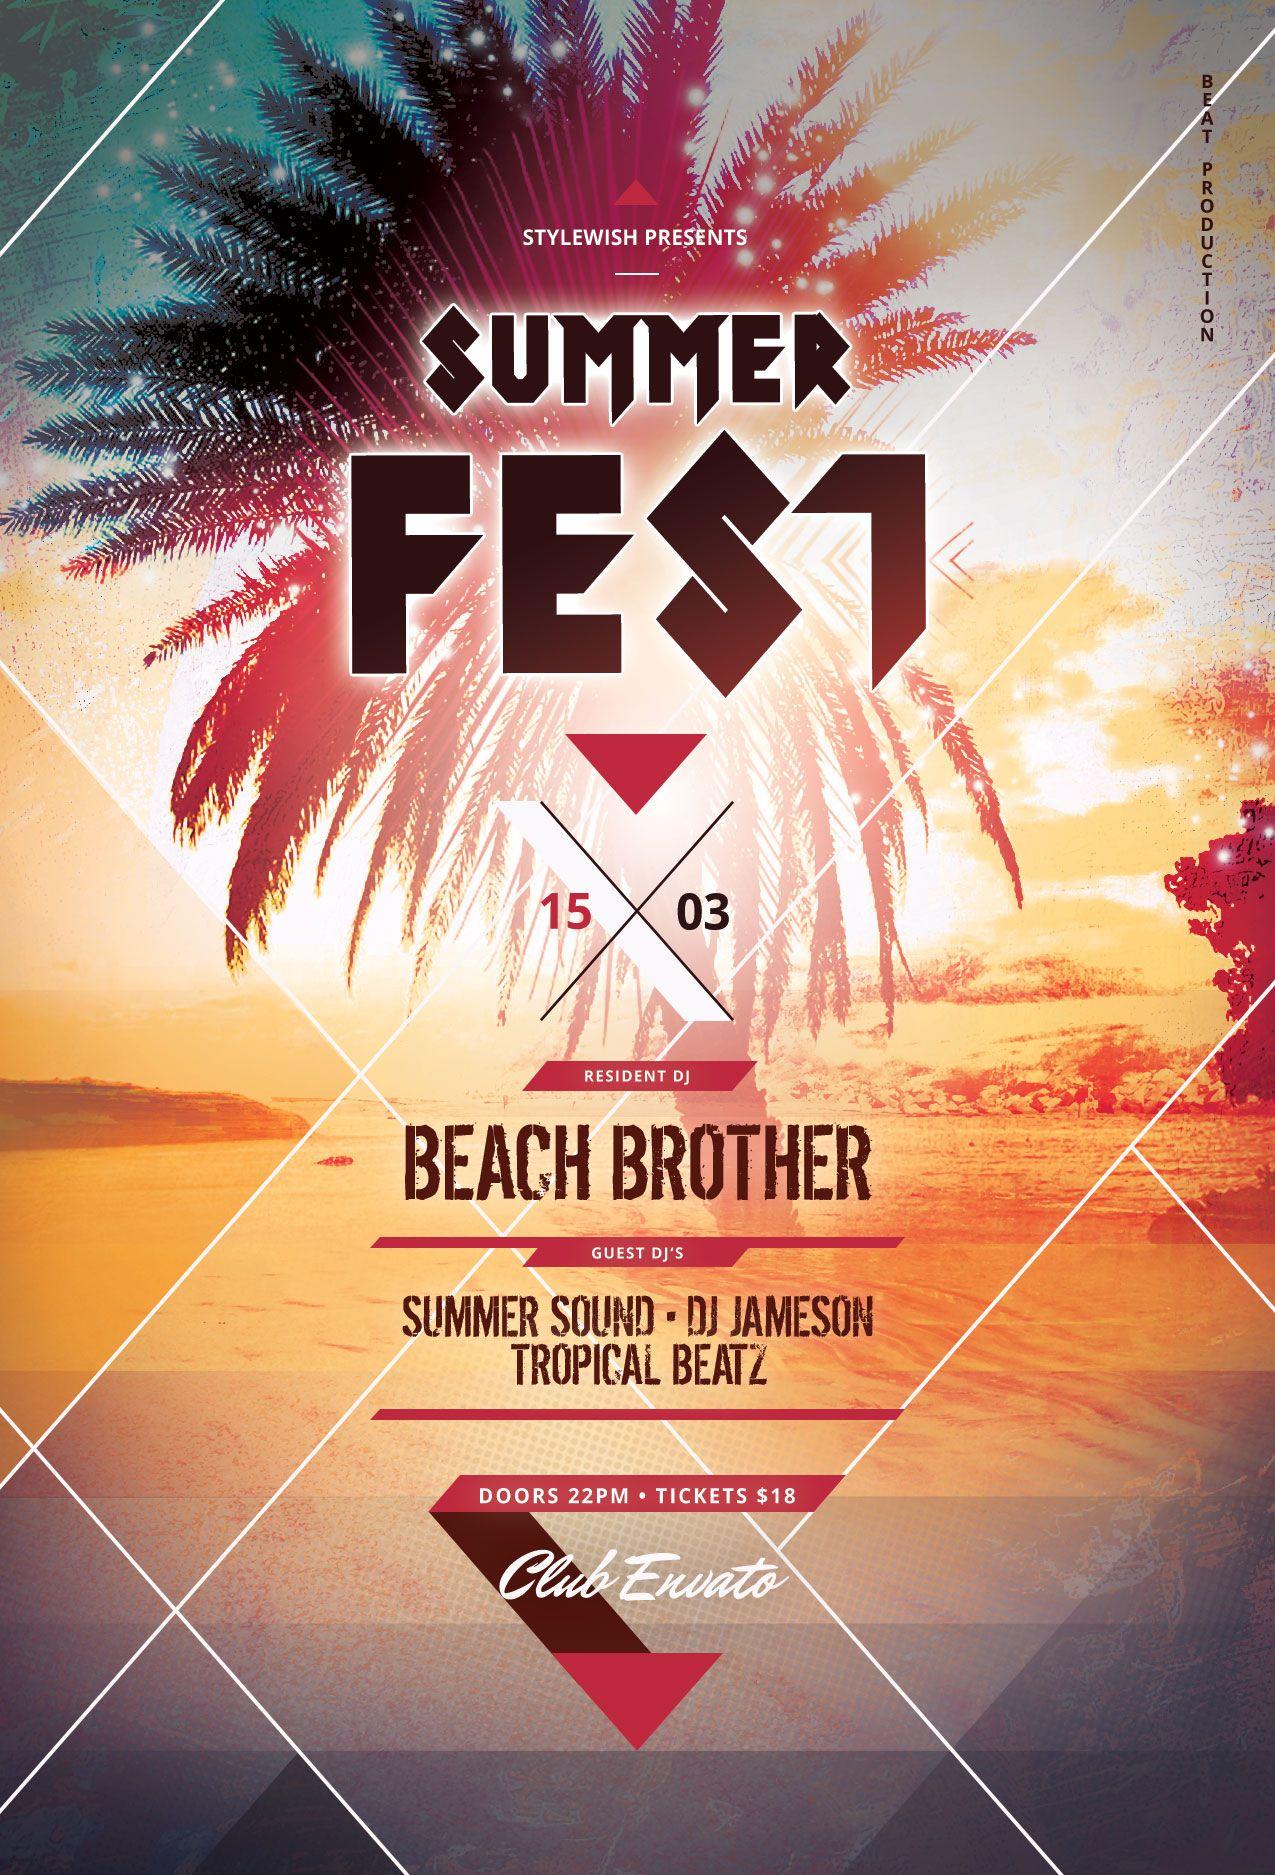 summer fest flyer template  download psd file